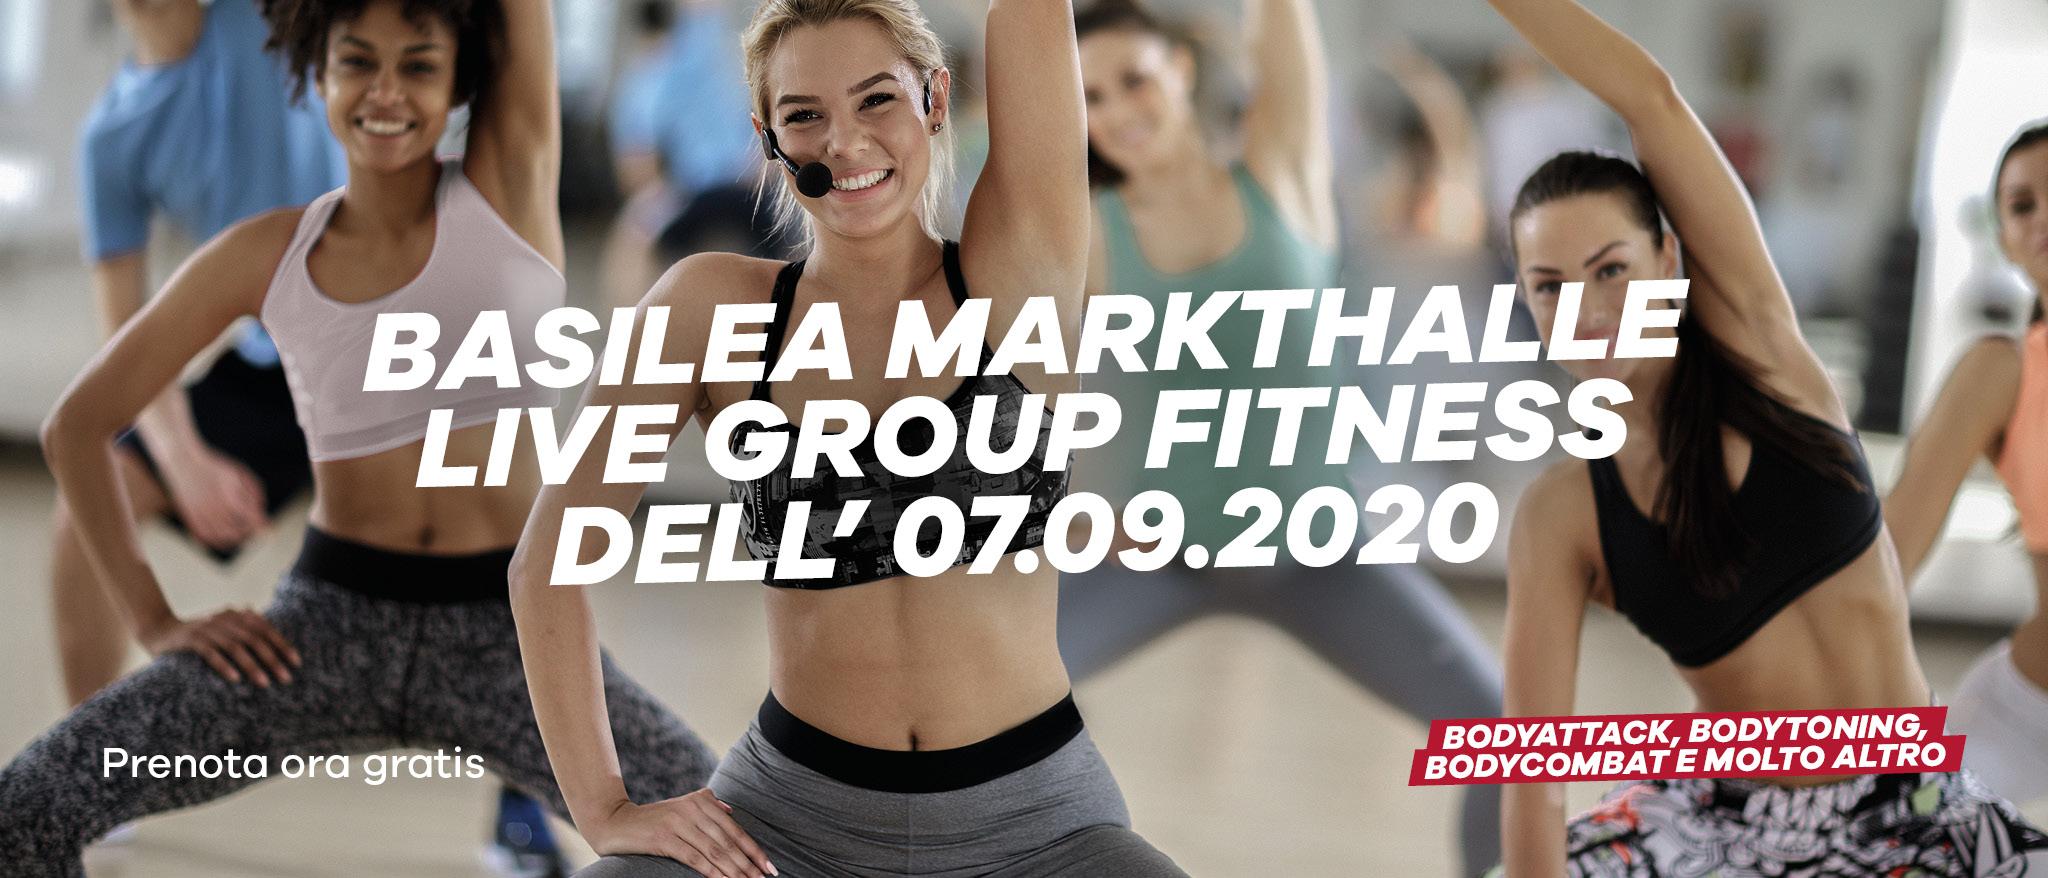 Live Group Fitness Basel Markthalle